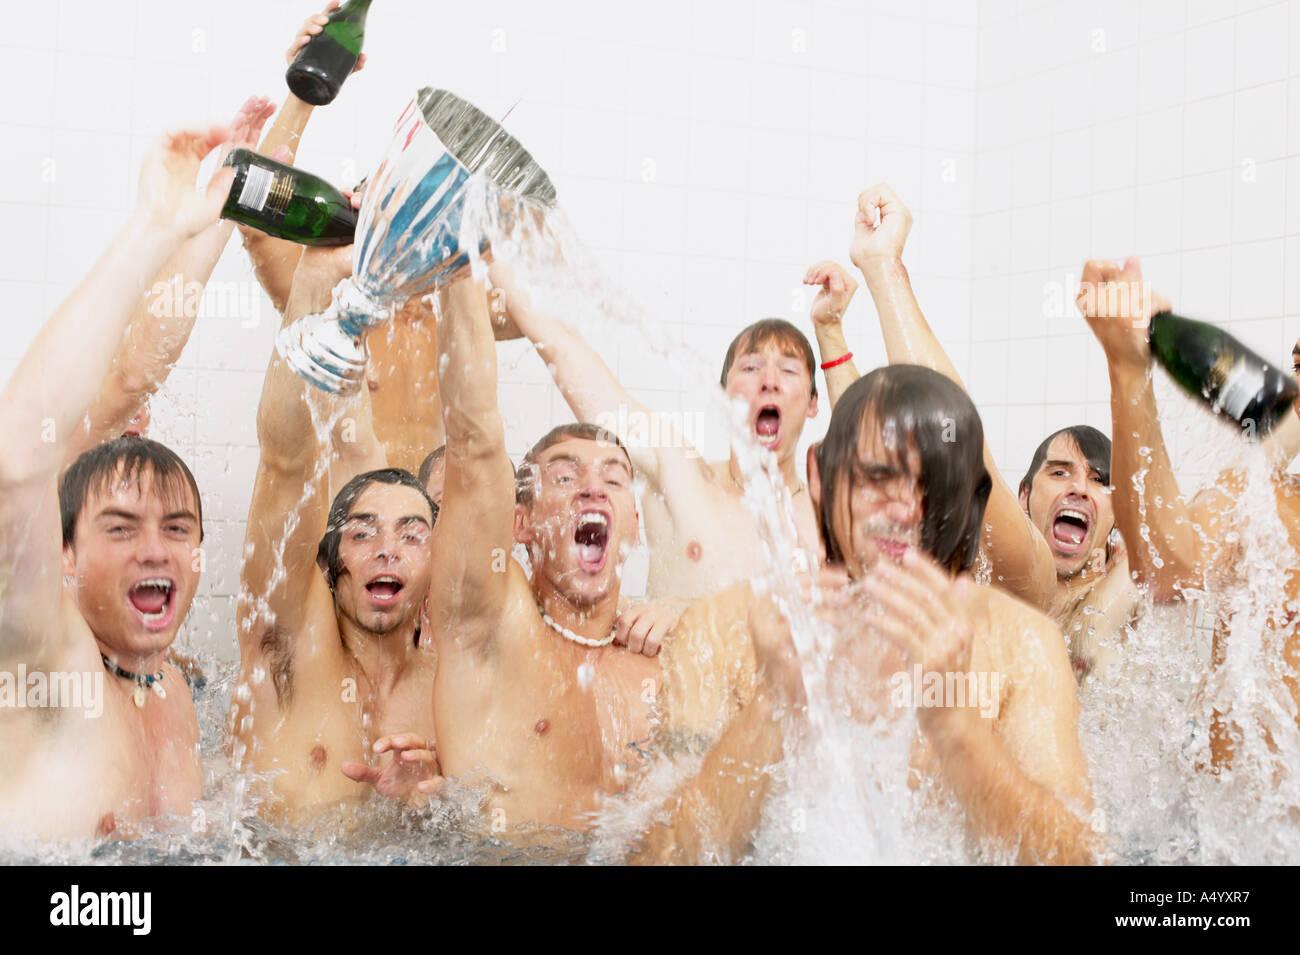 Winning football team in the bath - Stock Image